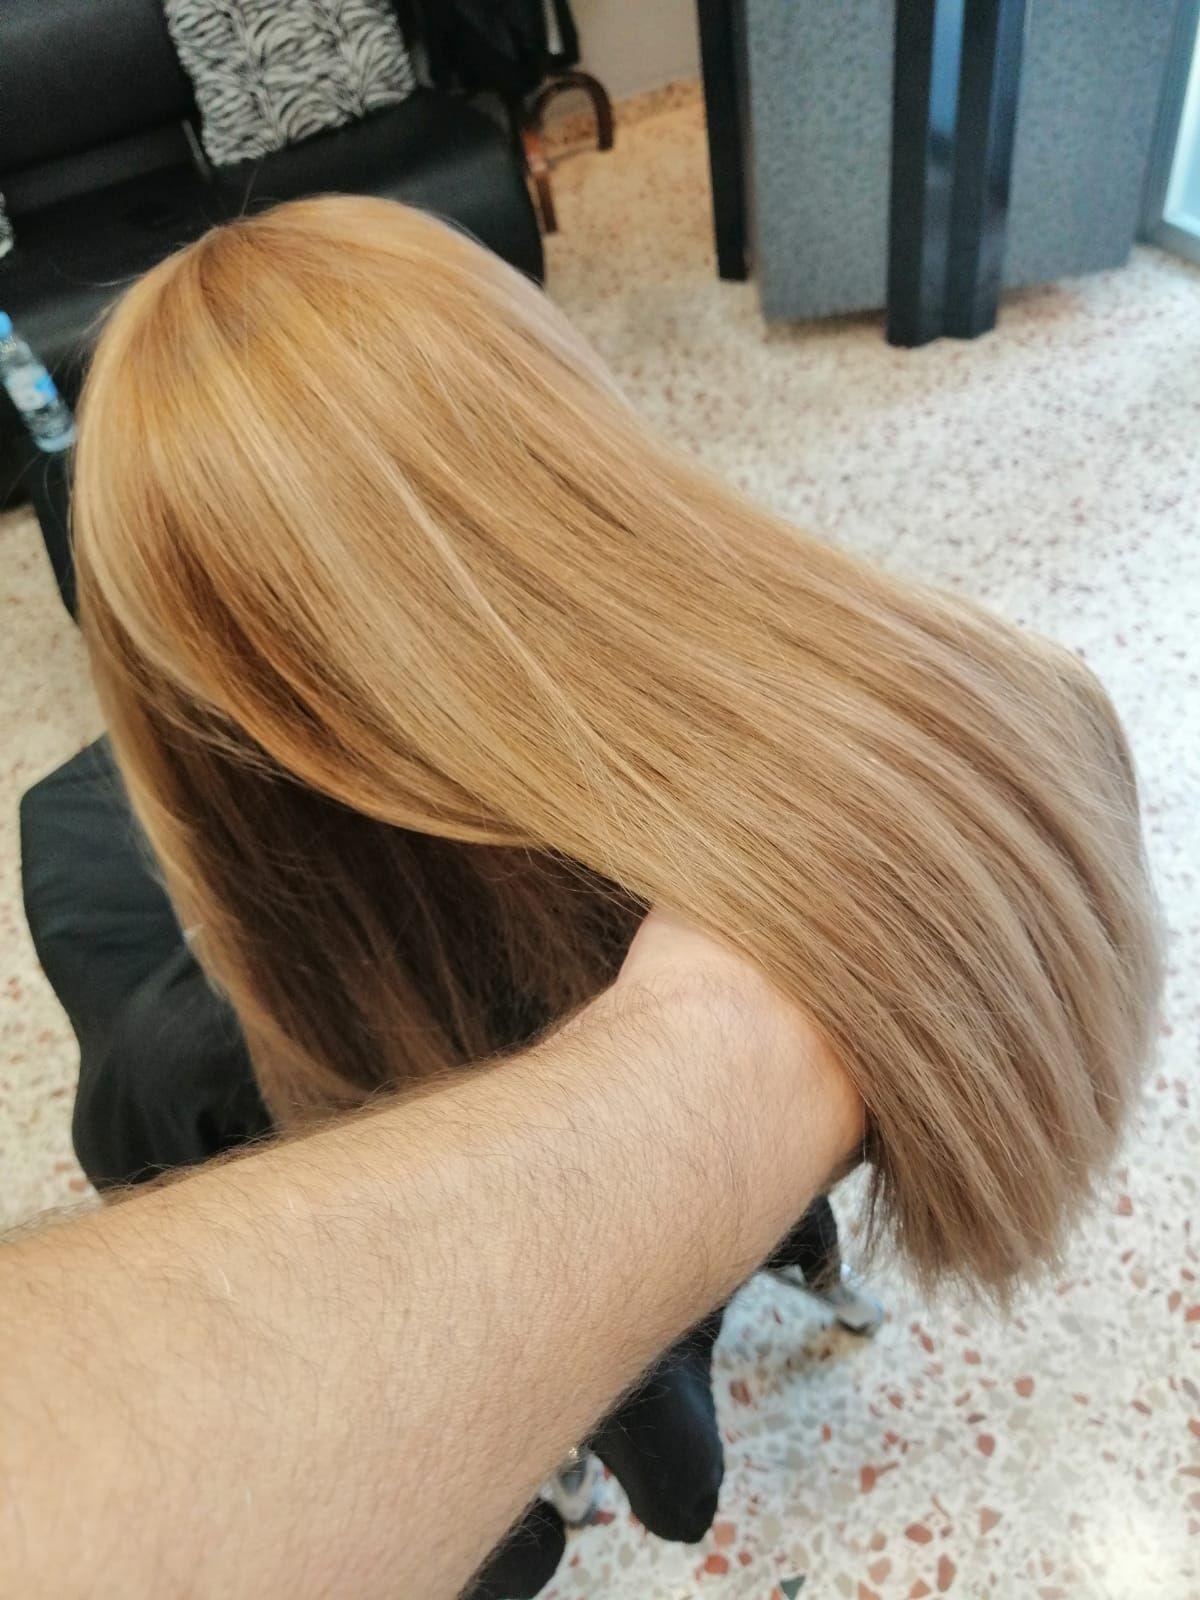 Foto 9 de Peluquería y maquillaje en  | Lucian Hair&Beauty